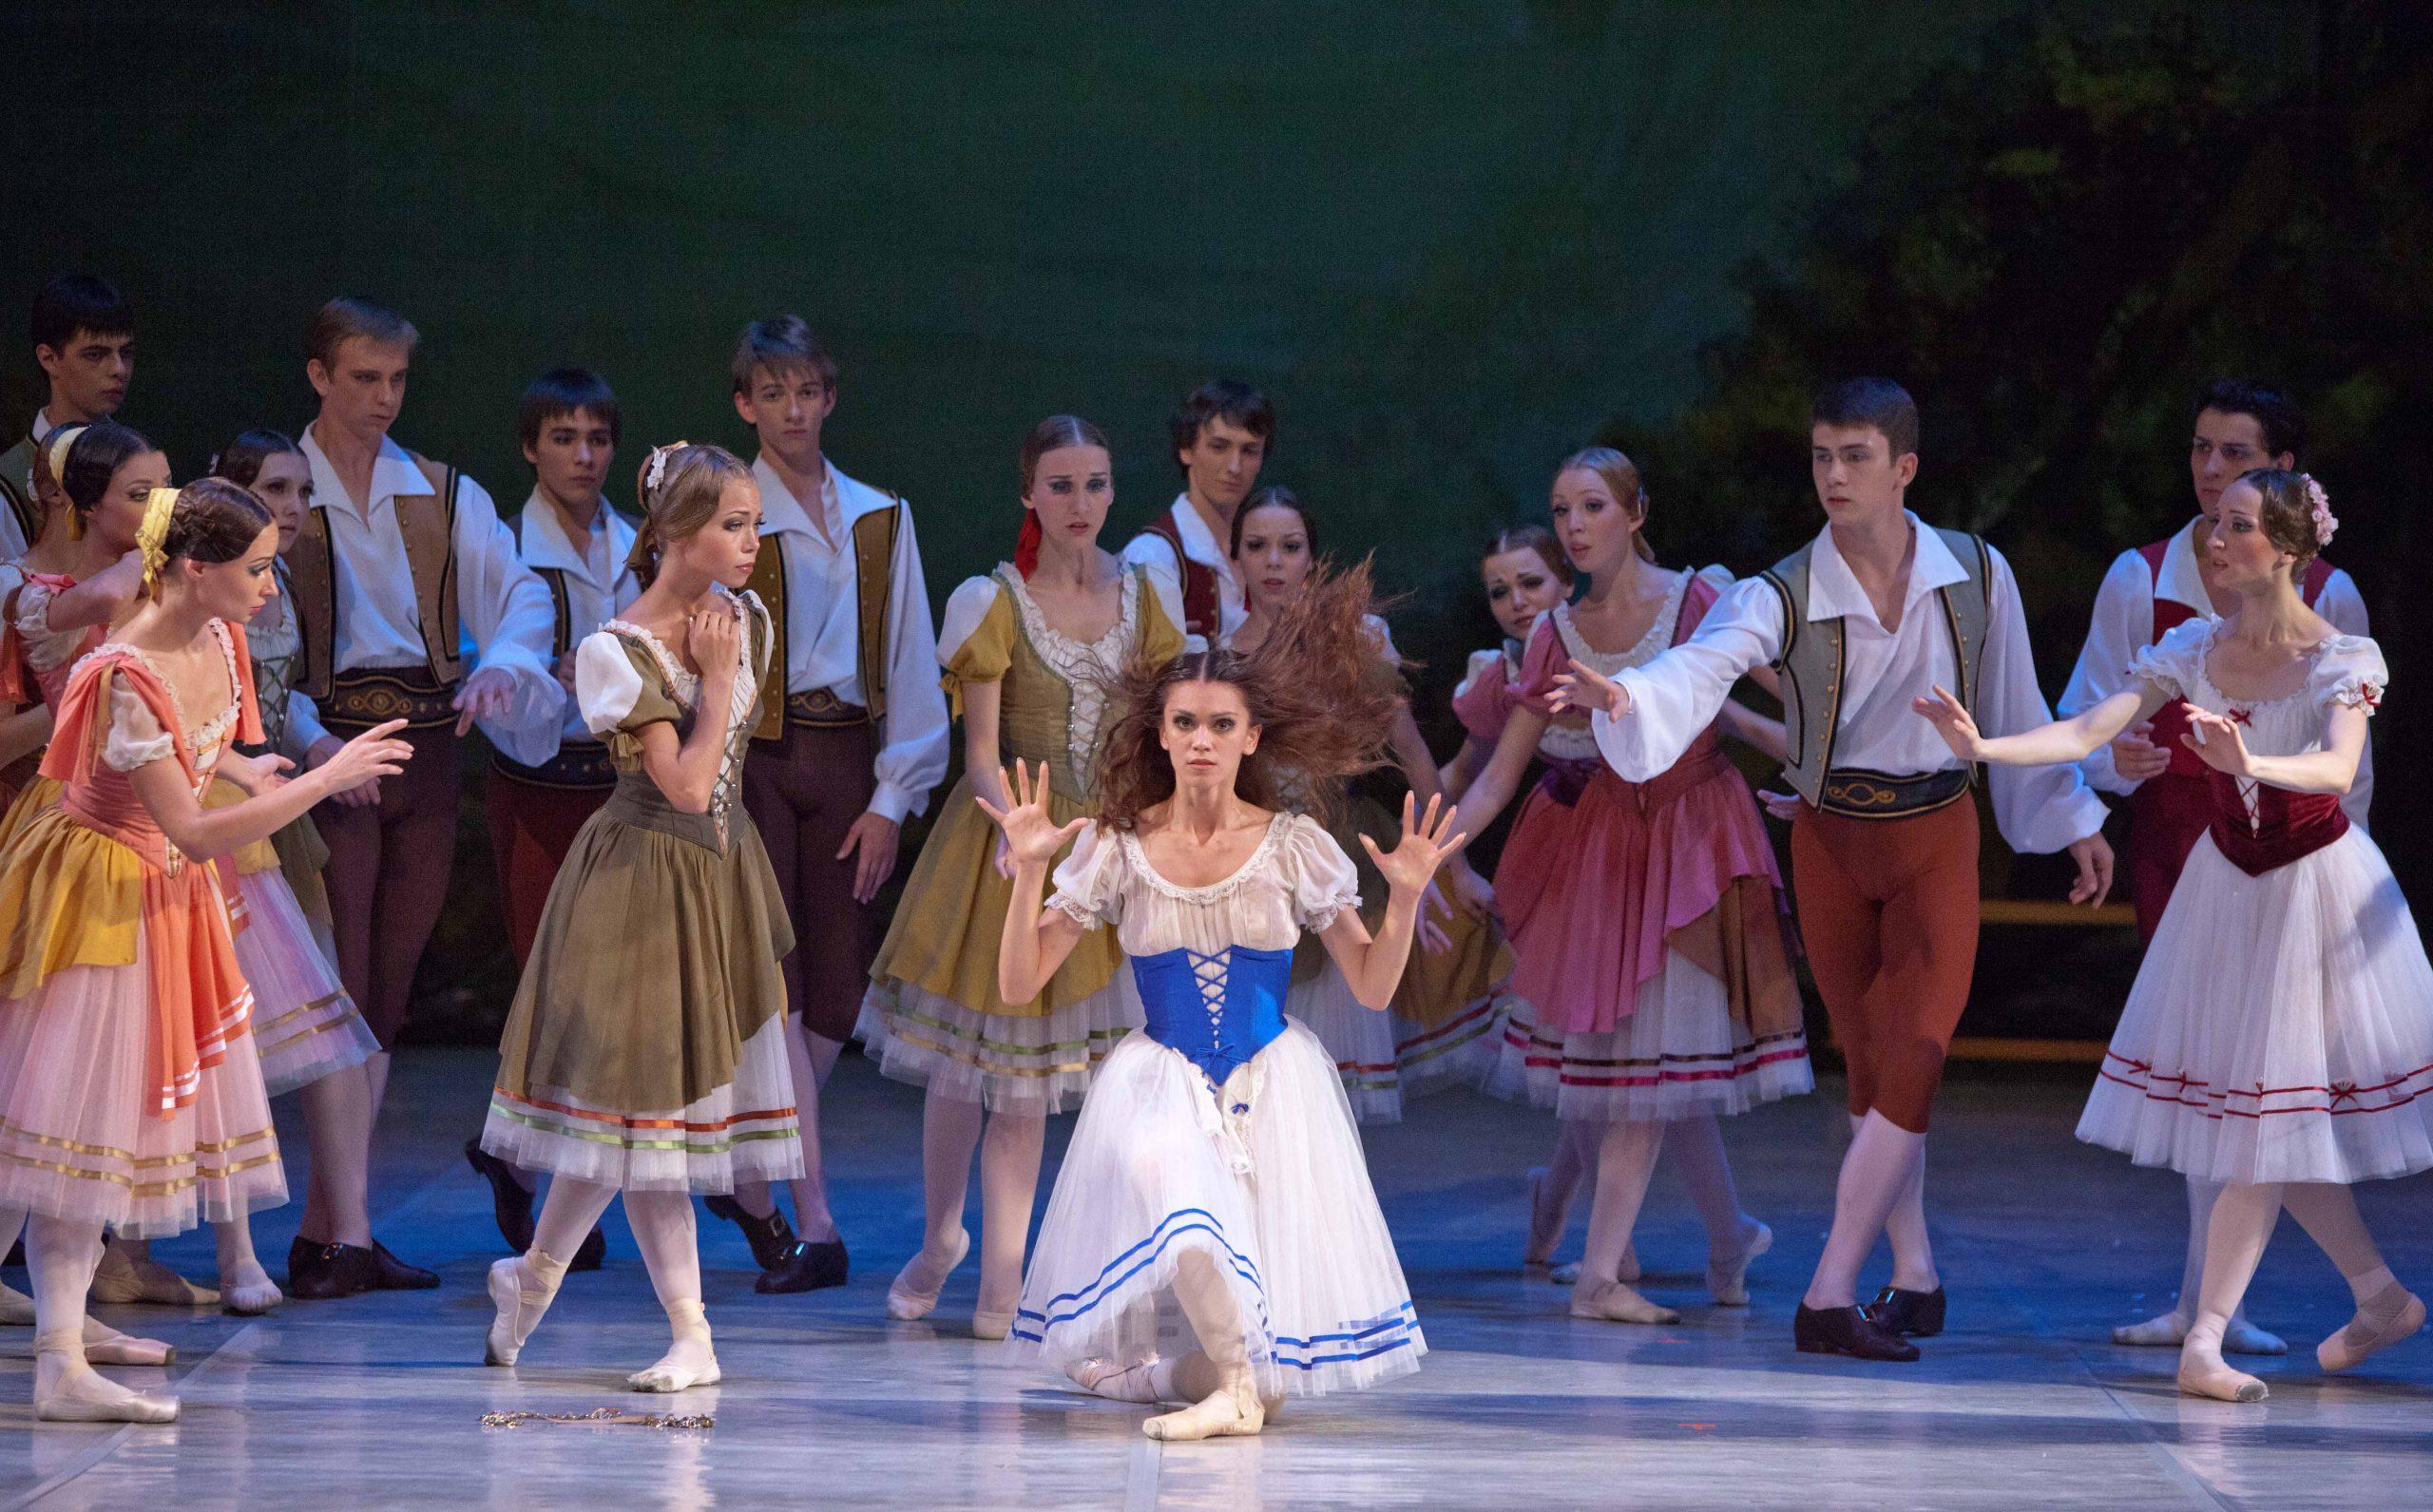 La dansa clàssica Giselle